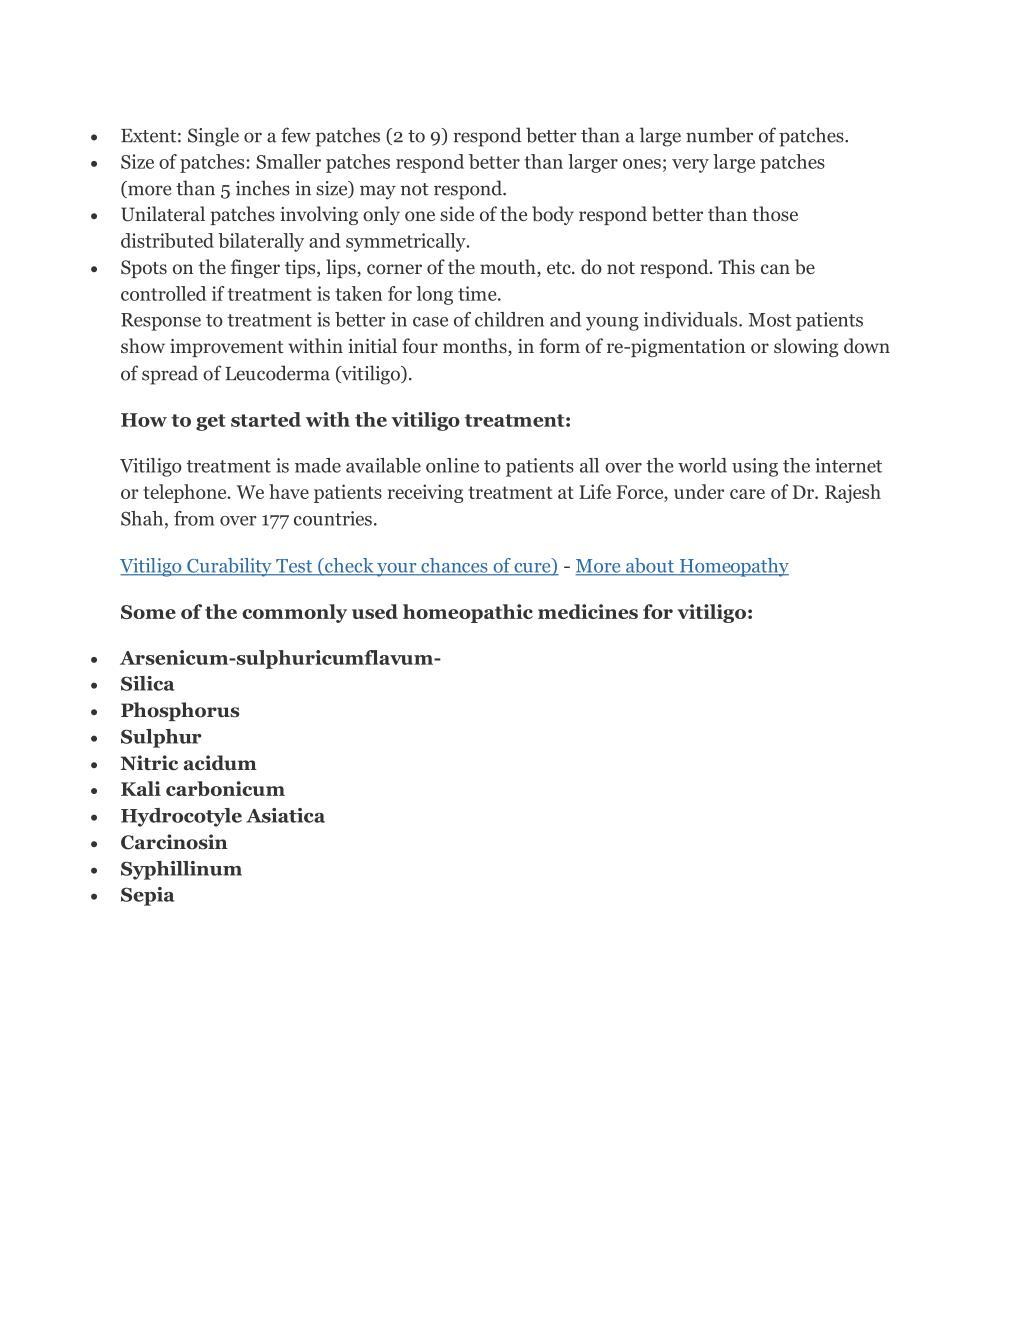 PPT - Homeopathic treatment for vitiligo PowerPoint